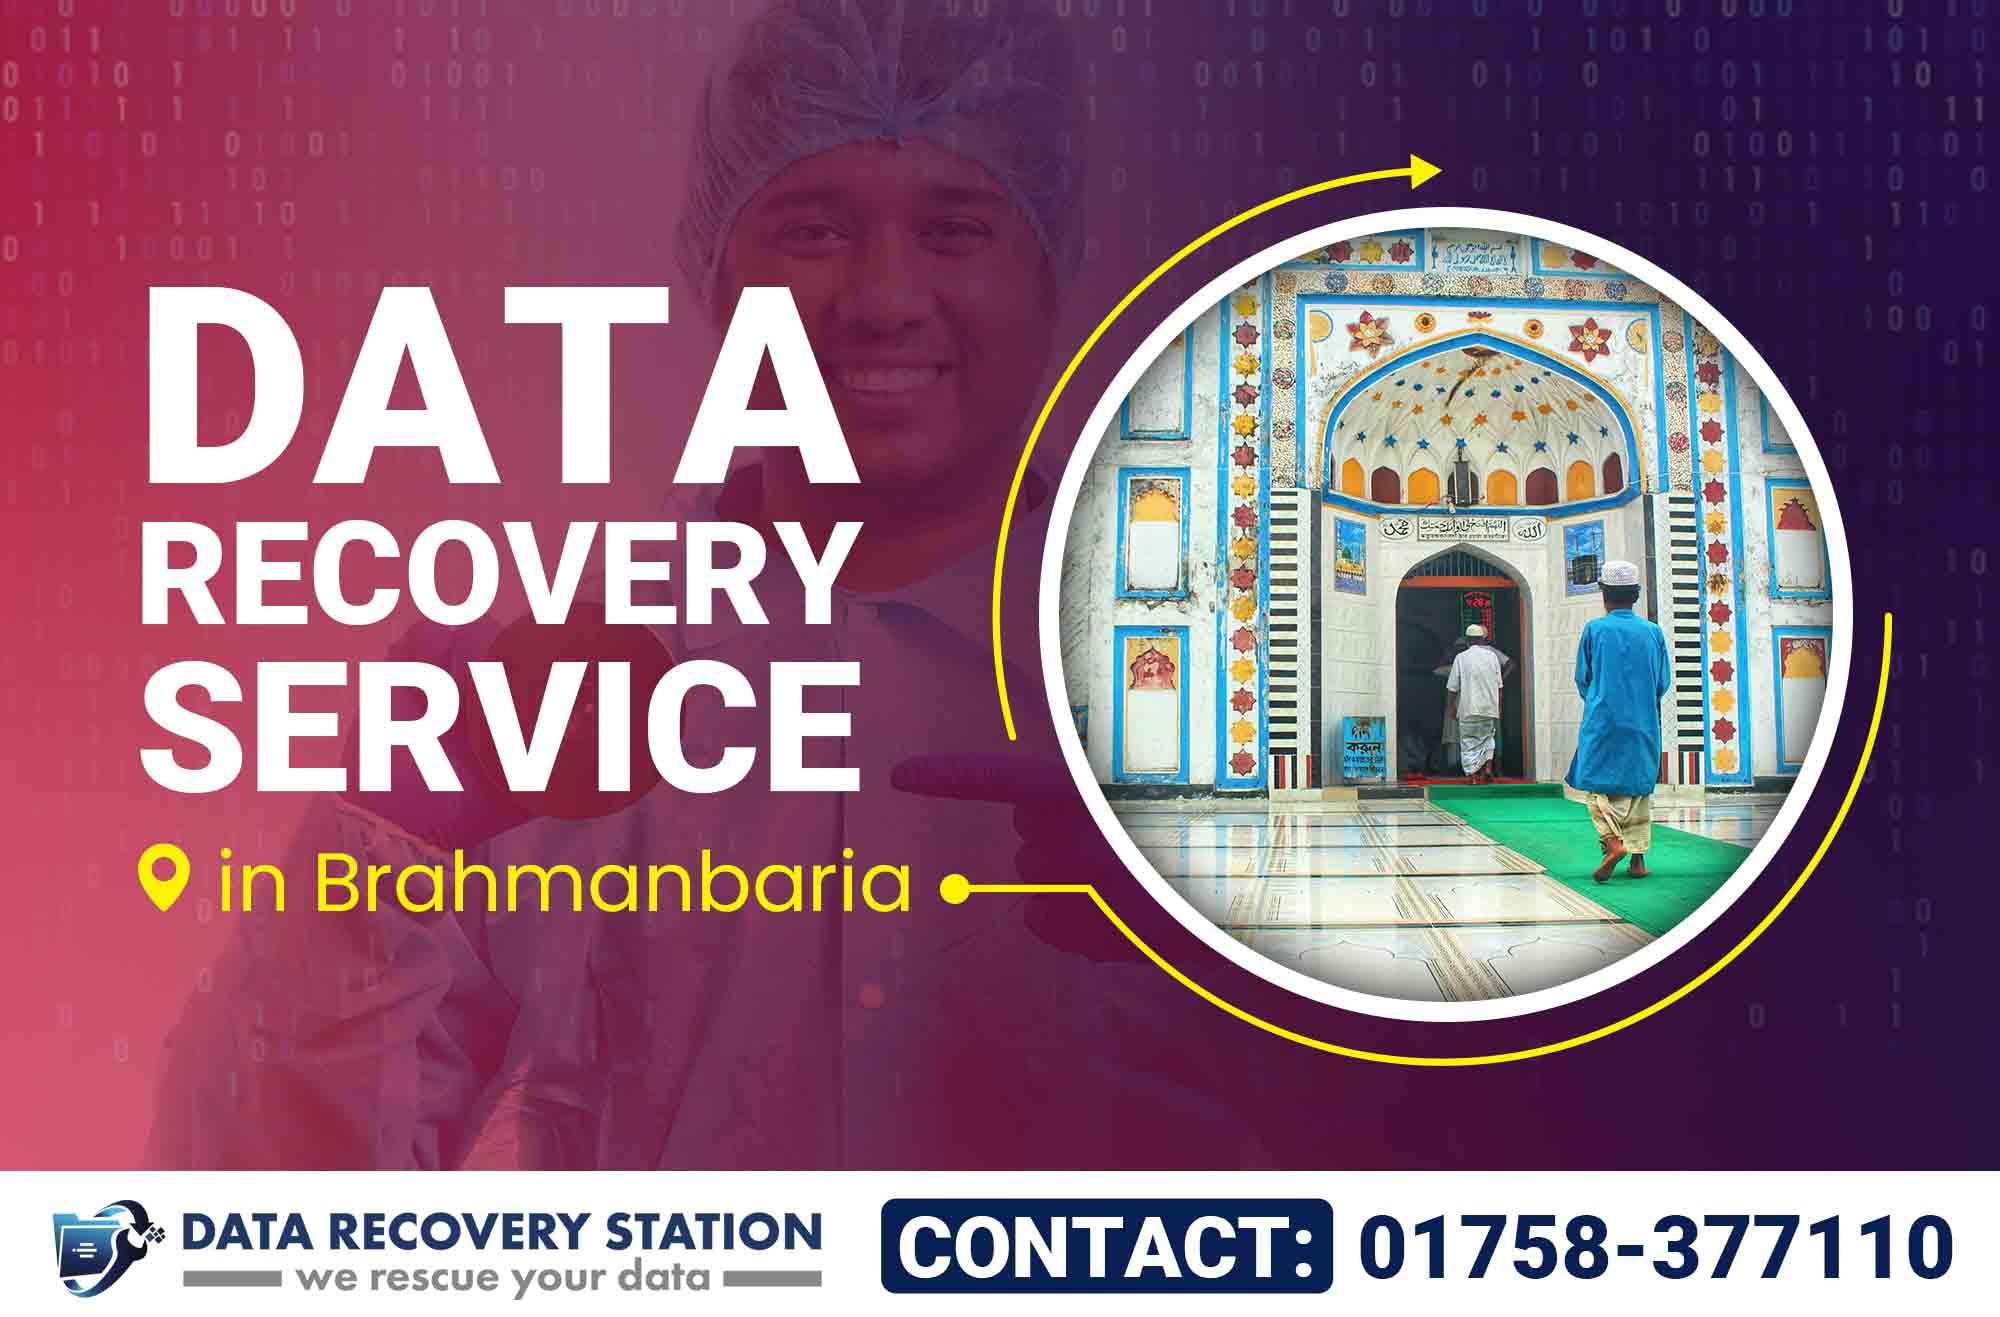 Data Recovery Service in Brahmanbaria